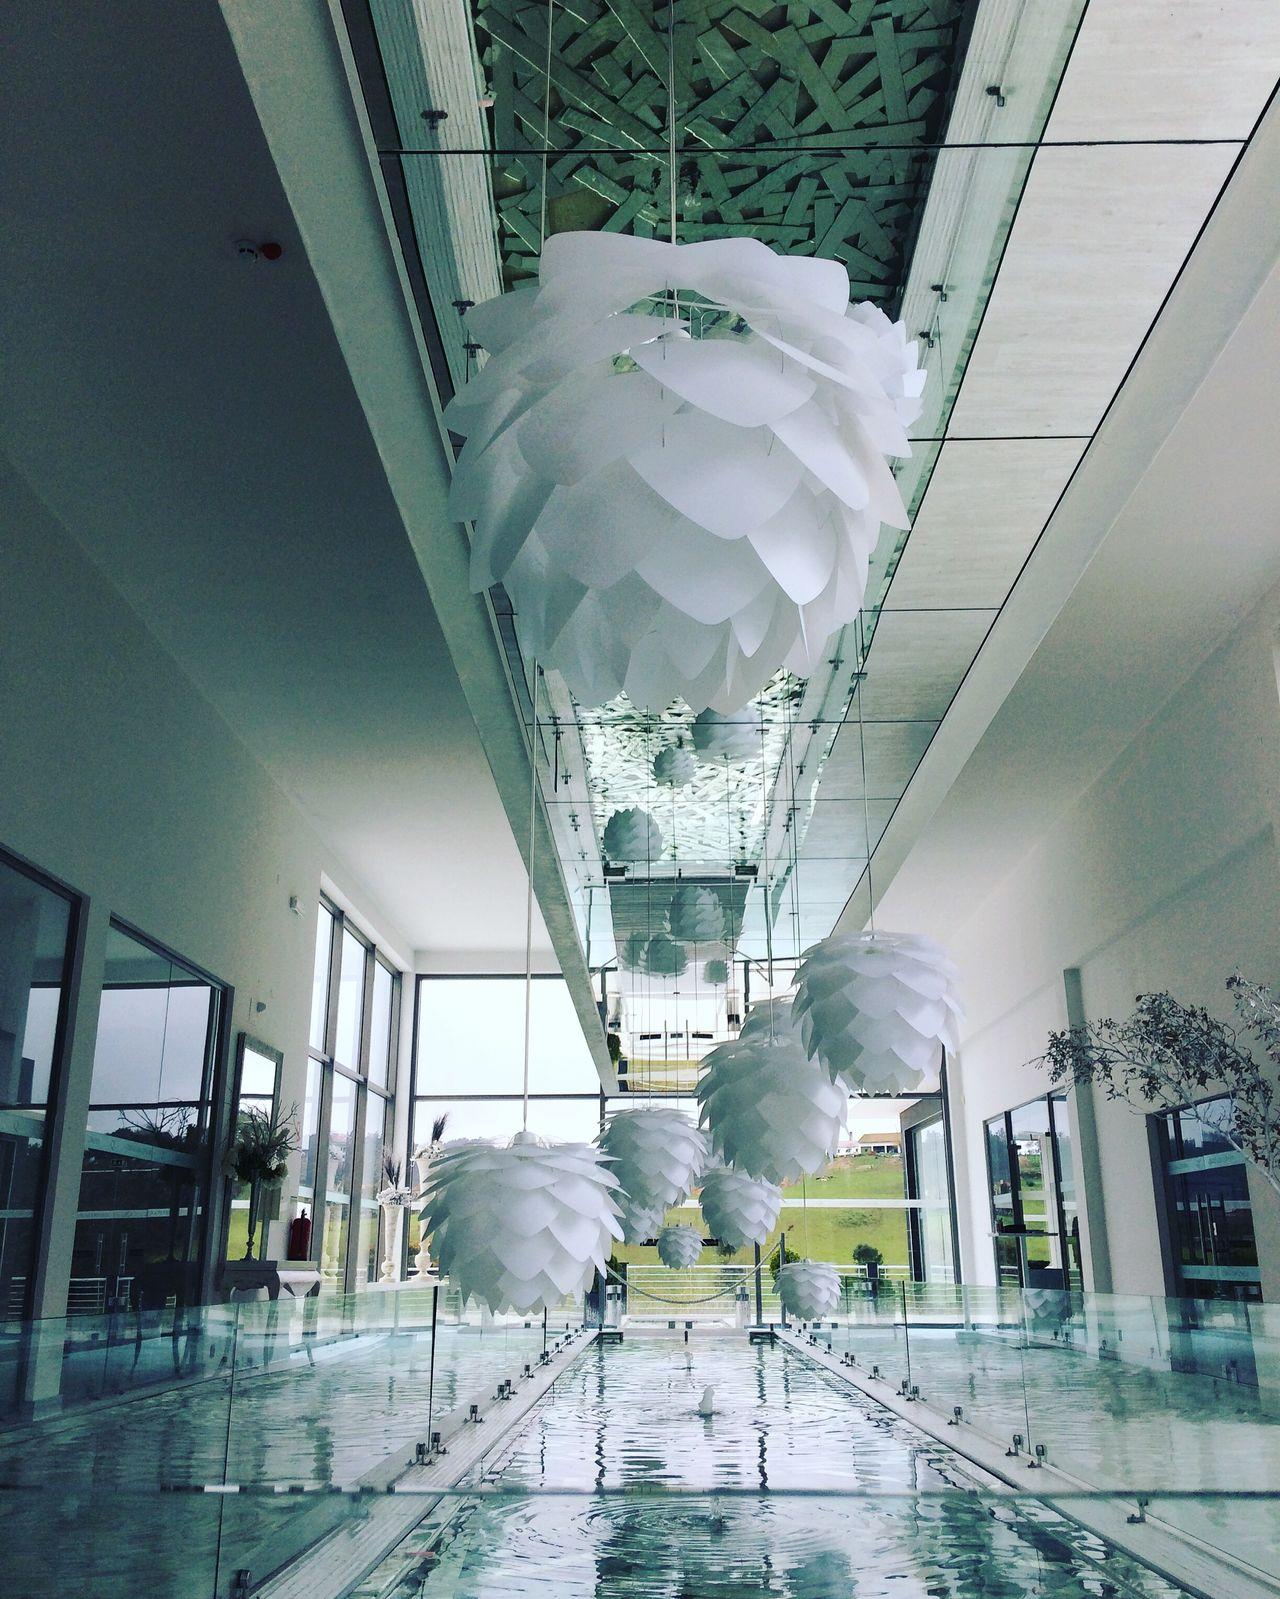 Design Architecture Modern Futuristic No People Architectural Detail